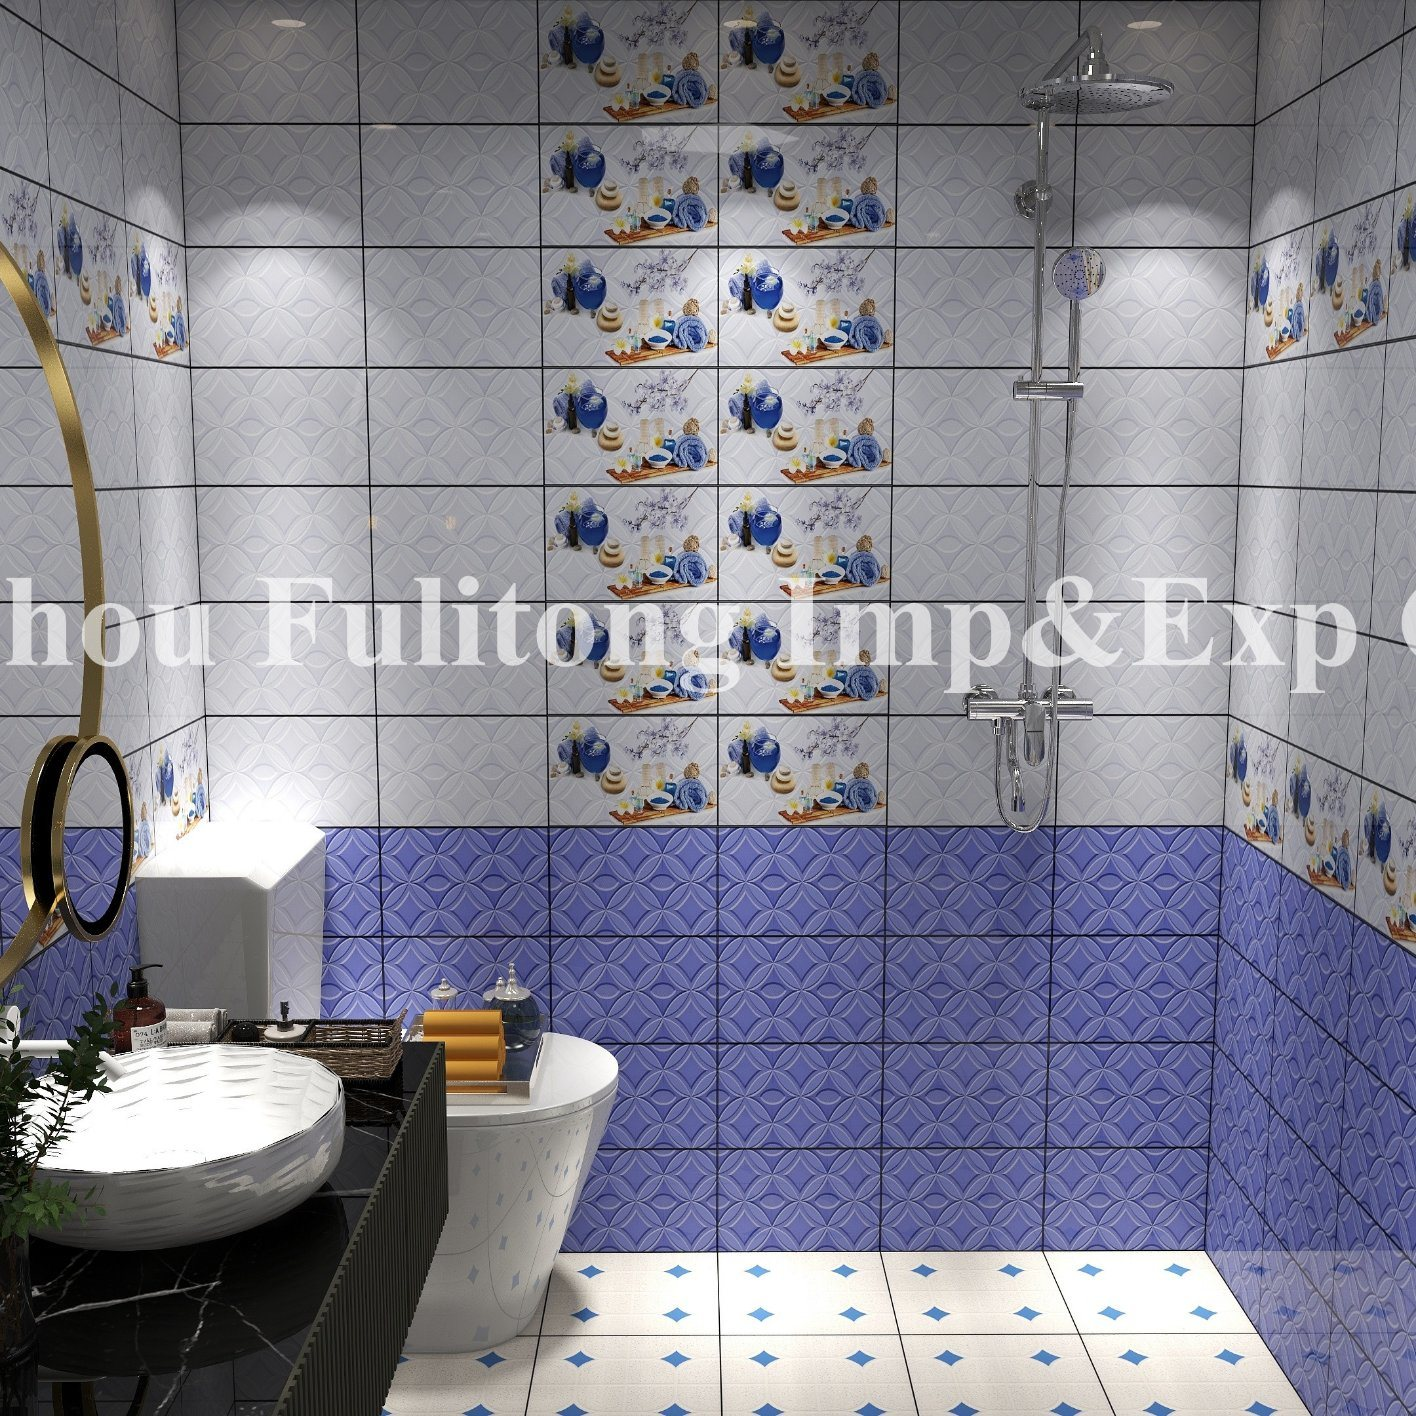 New Designs Ceramic Bathroom Wall Tiles, Tile Designs For Bathroom